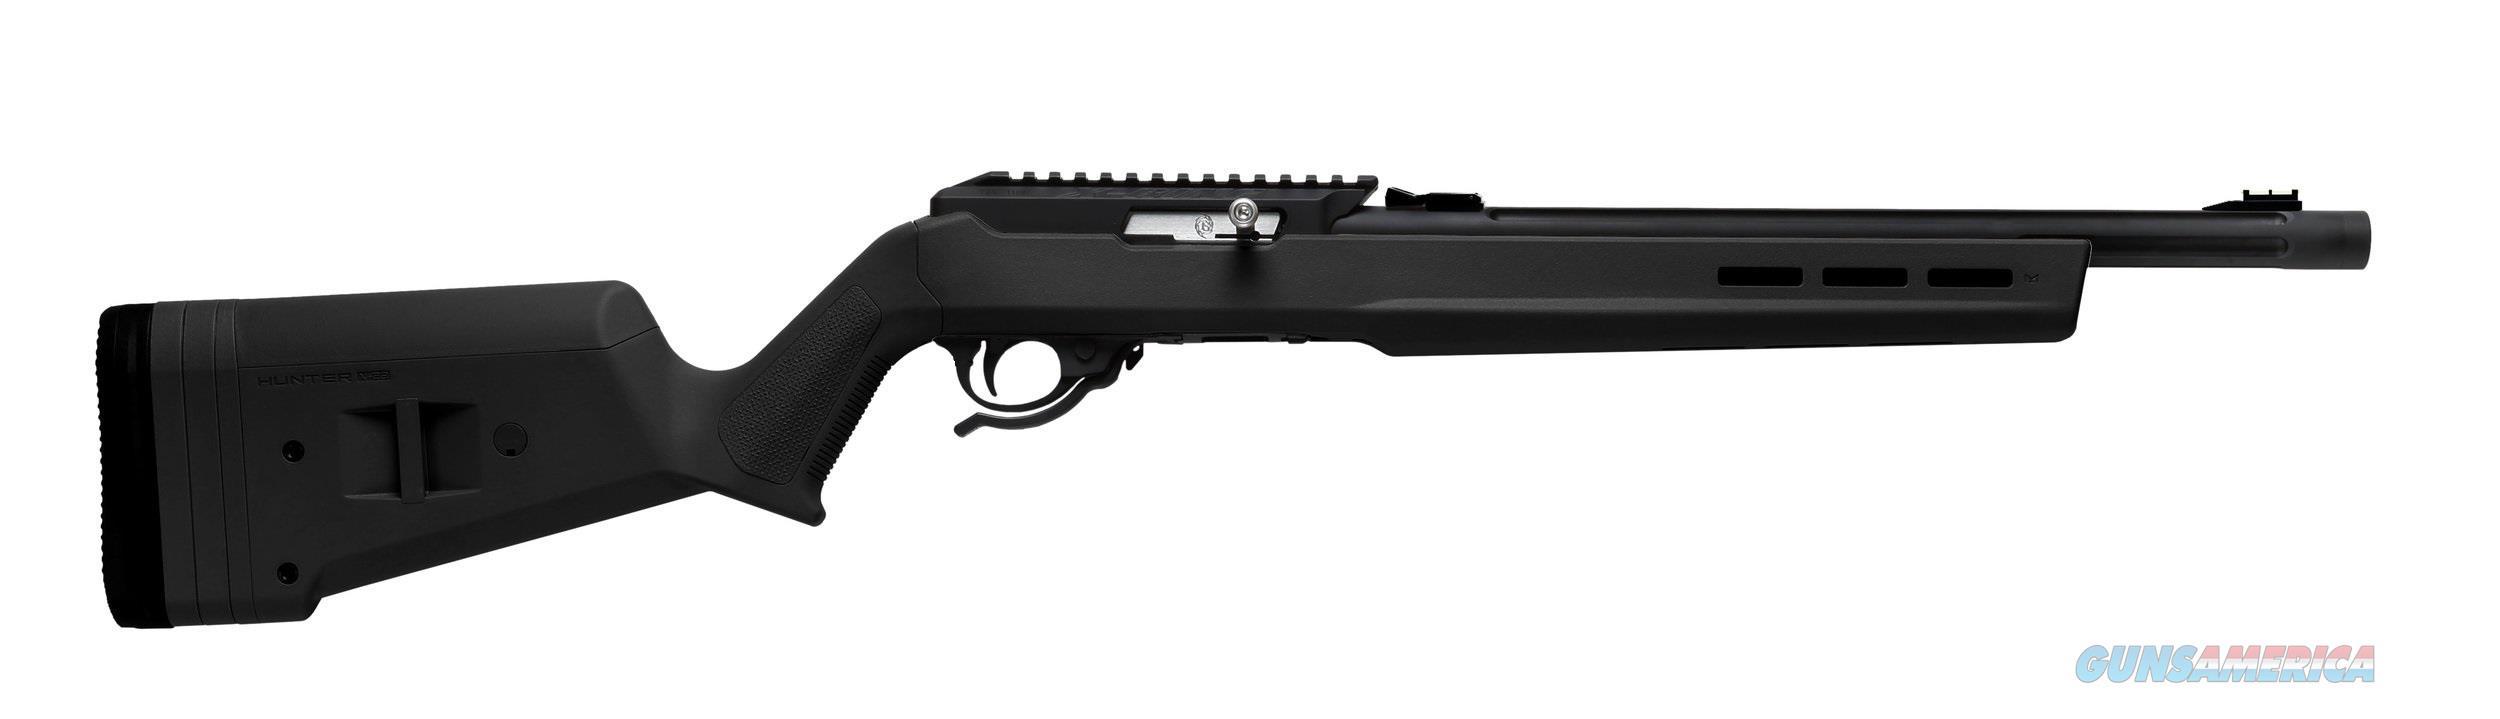 Tactical Solutions X-Ring Rifle Open Sights Magpul Black / Black .22 LR 10/22 OS-MB-B-M-BLK   Guns > Rifles > Ruger Rifles > 10-22